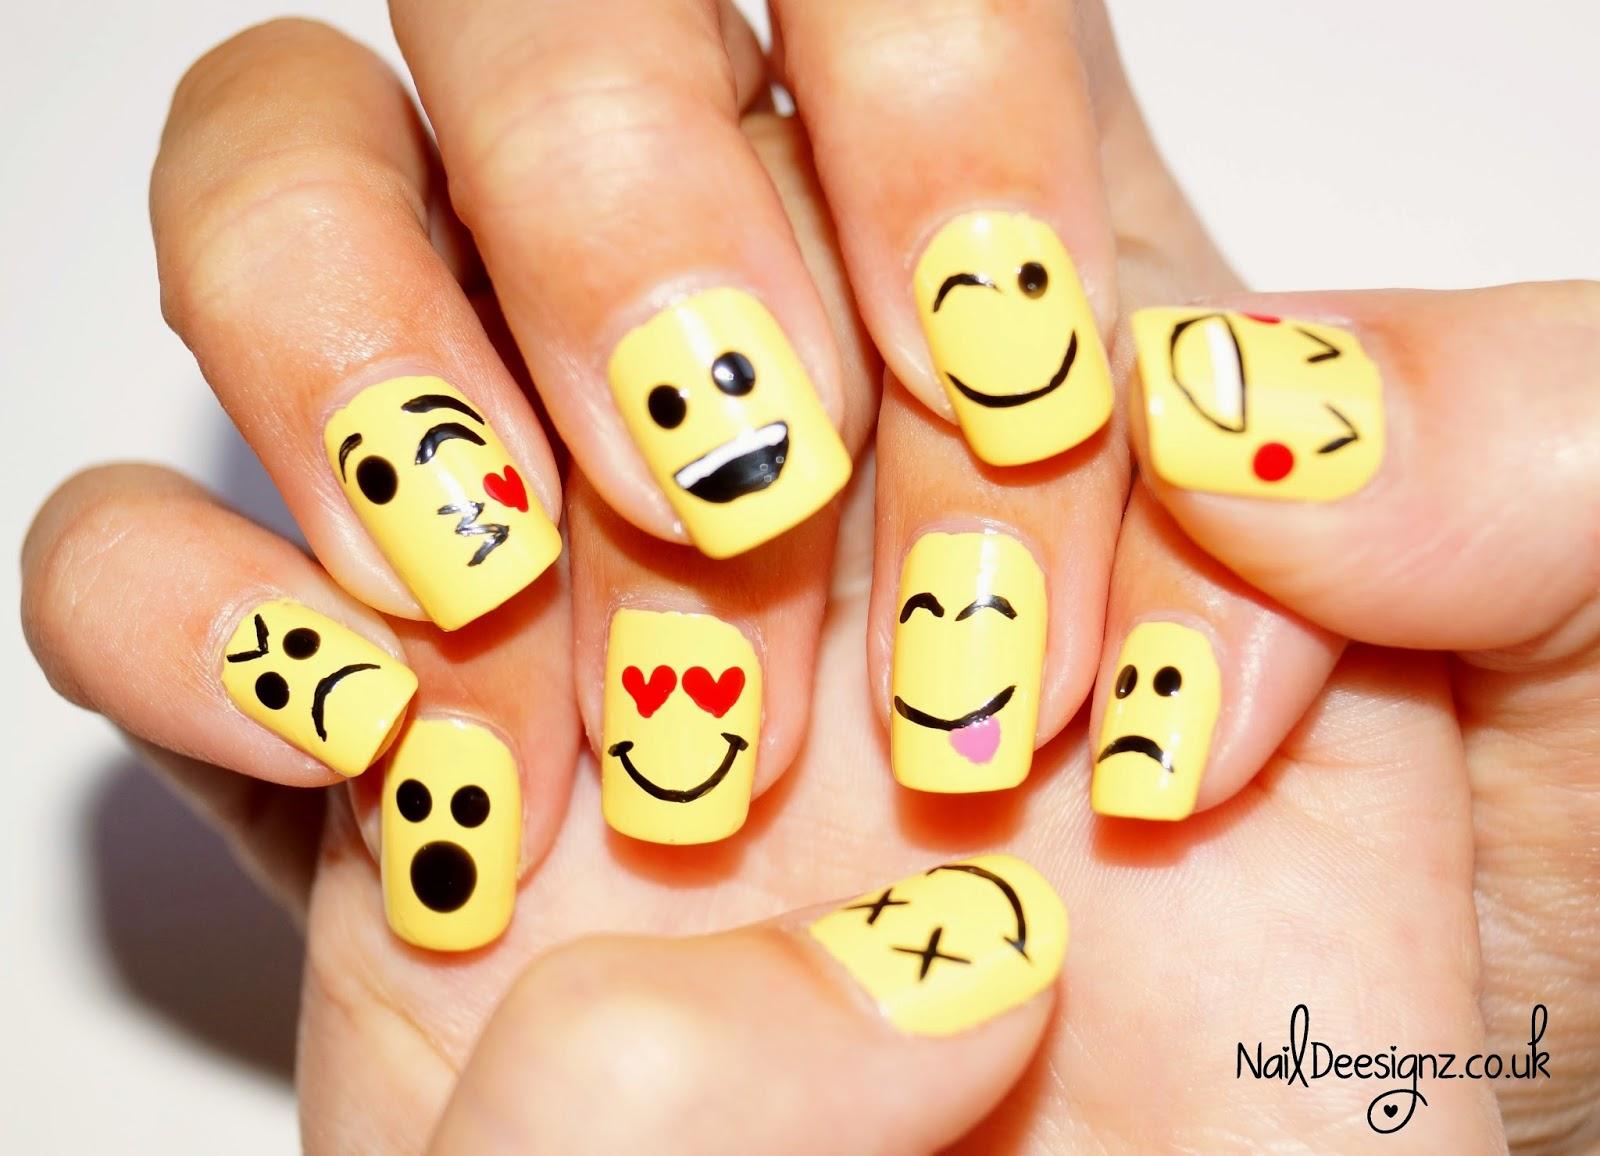 Naildeesignz Emoticon Nail Art